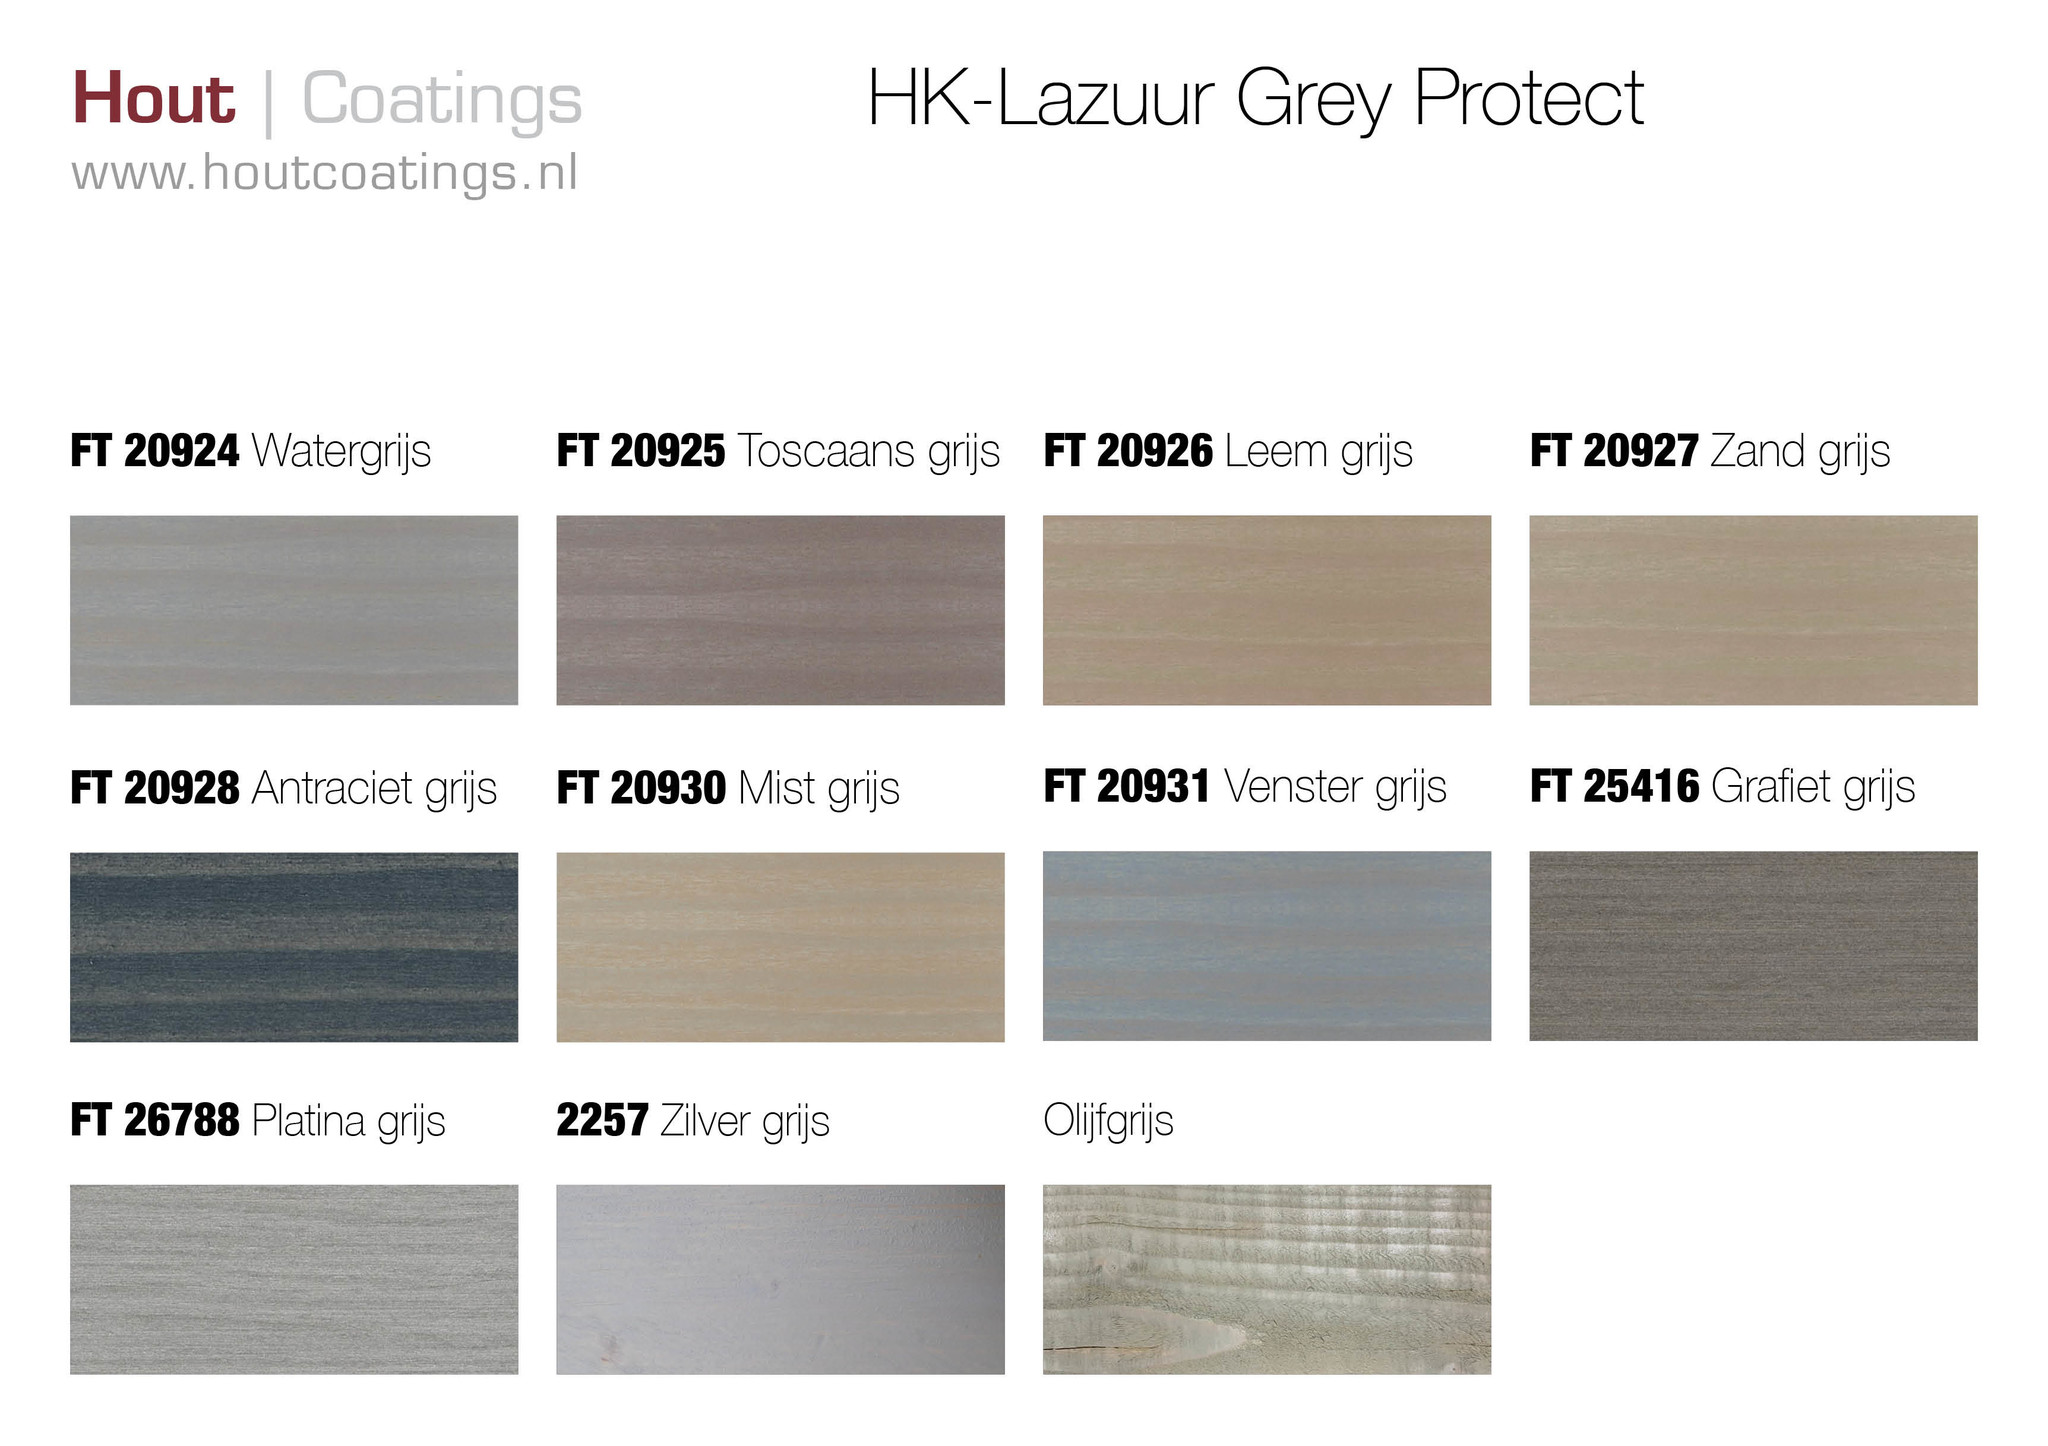 Remmers kleuren HK lazuur grey protect